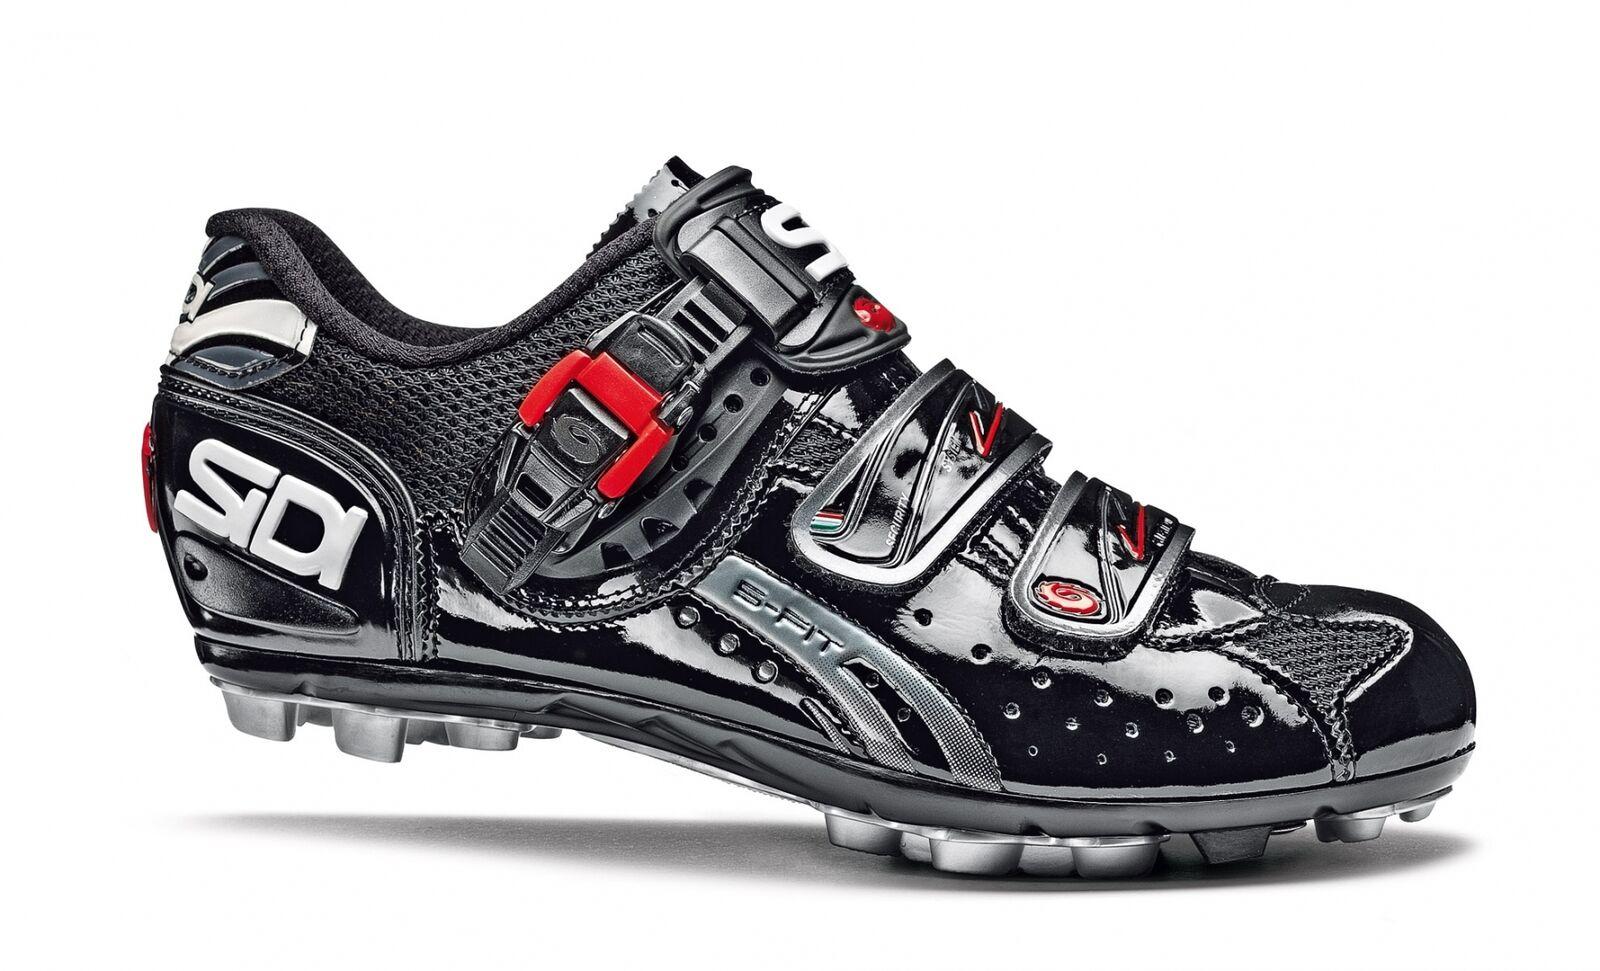 Zapatos para mujer mtb Sidi Eagle 5-Fit - Negro